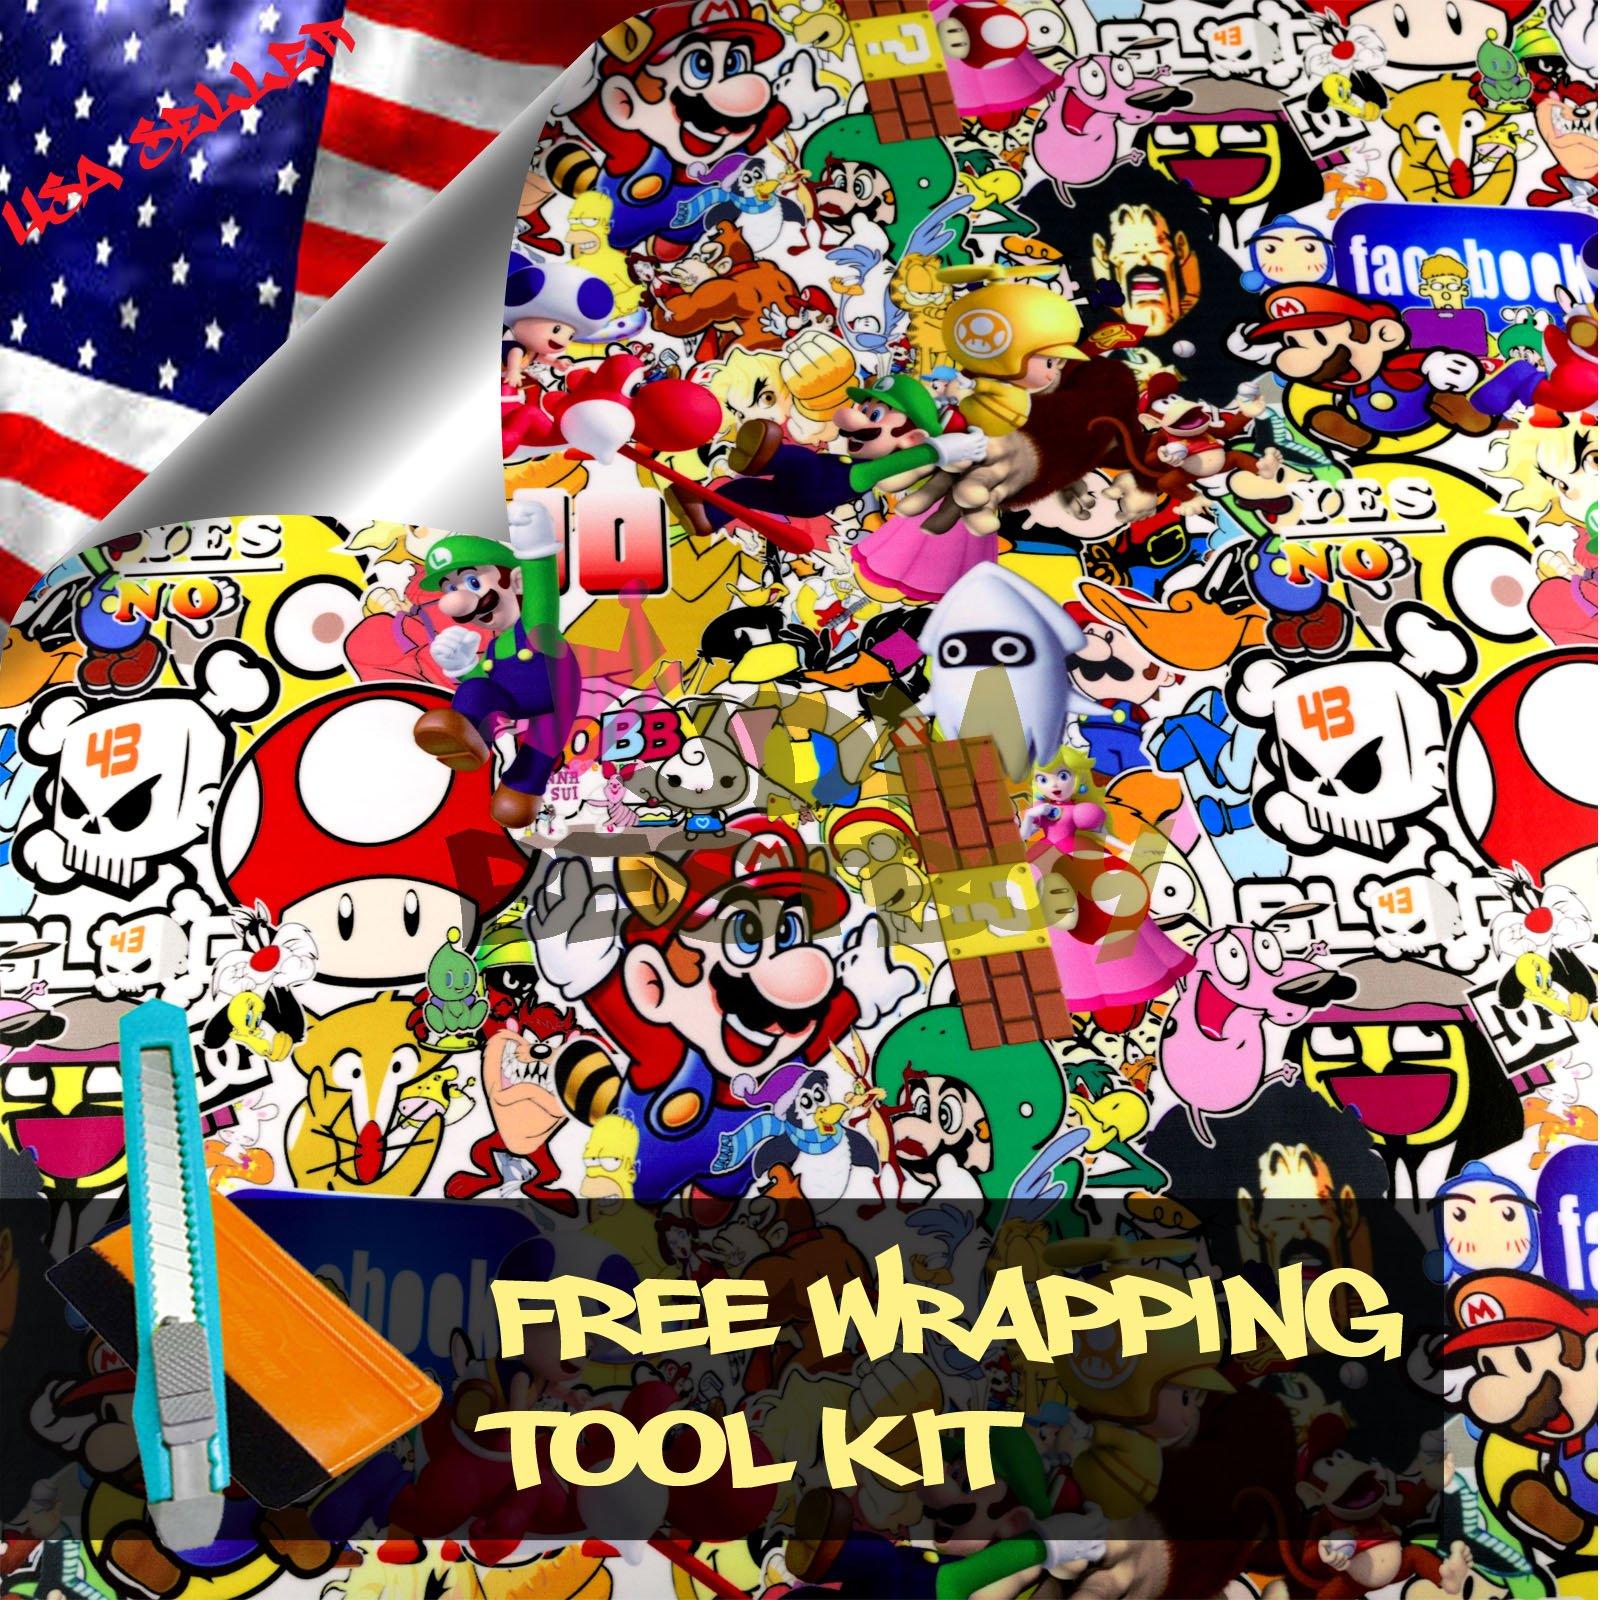 Free Tool Kit MAO JDM Bomber Anime Graffiti Cartoon Car Auto Laptop Vinyl Wrap Sticker Decal Film Sheet - 60''X600'' by JDMBESTBOY (Image #1)